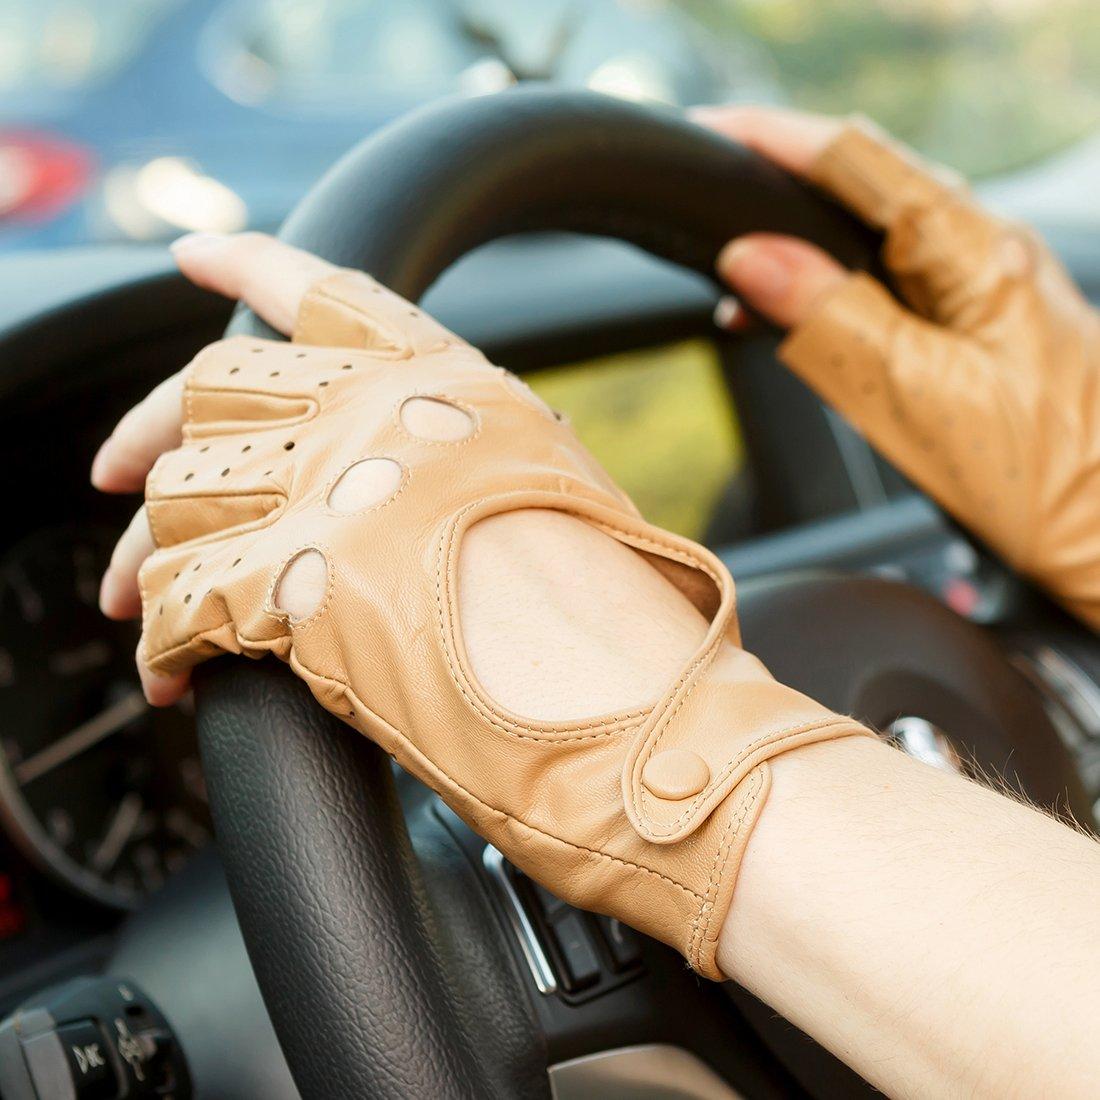 Nappaglo Women s CLASSIC medio dedo de cuero de piel de cordero conduccion guantes fingerless guantes de fitness al aire libre sin forro